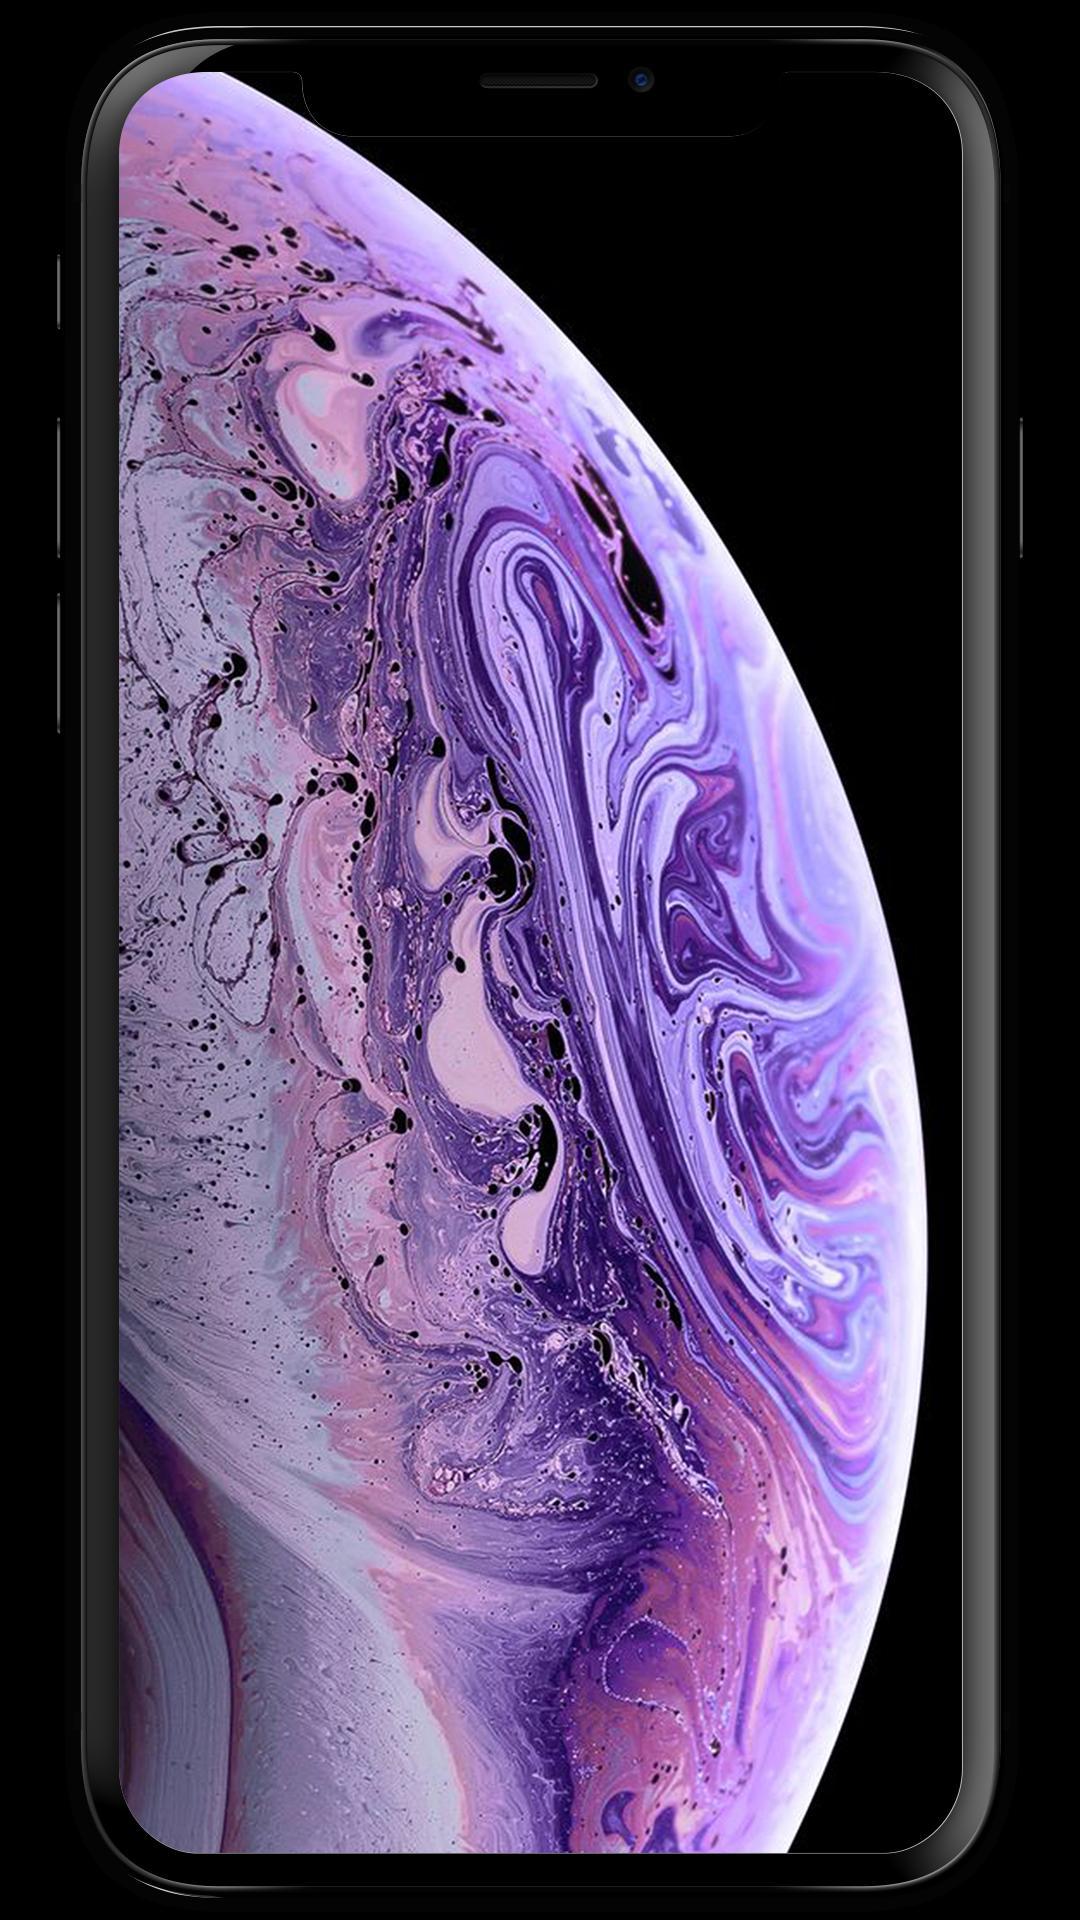 4k Ultra Hd Iphone Xr Home Screen Wallpaper Doraemon